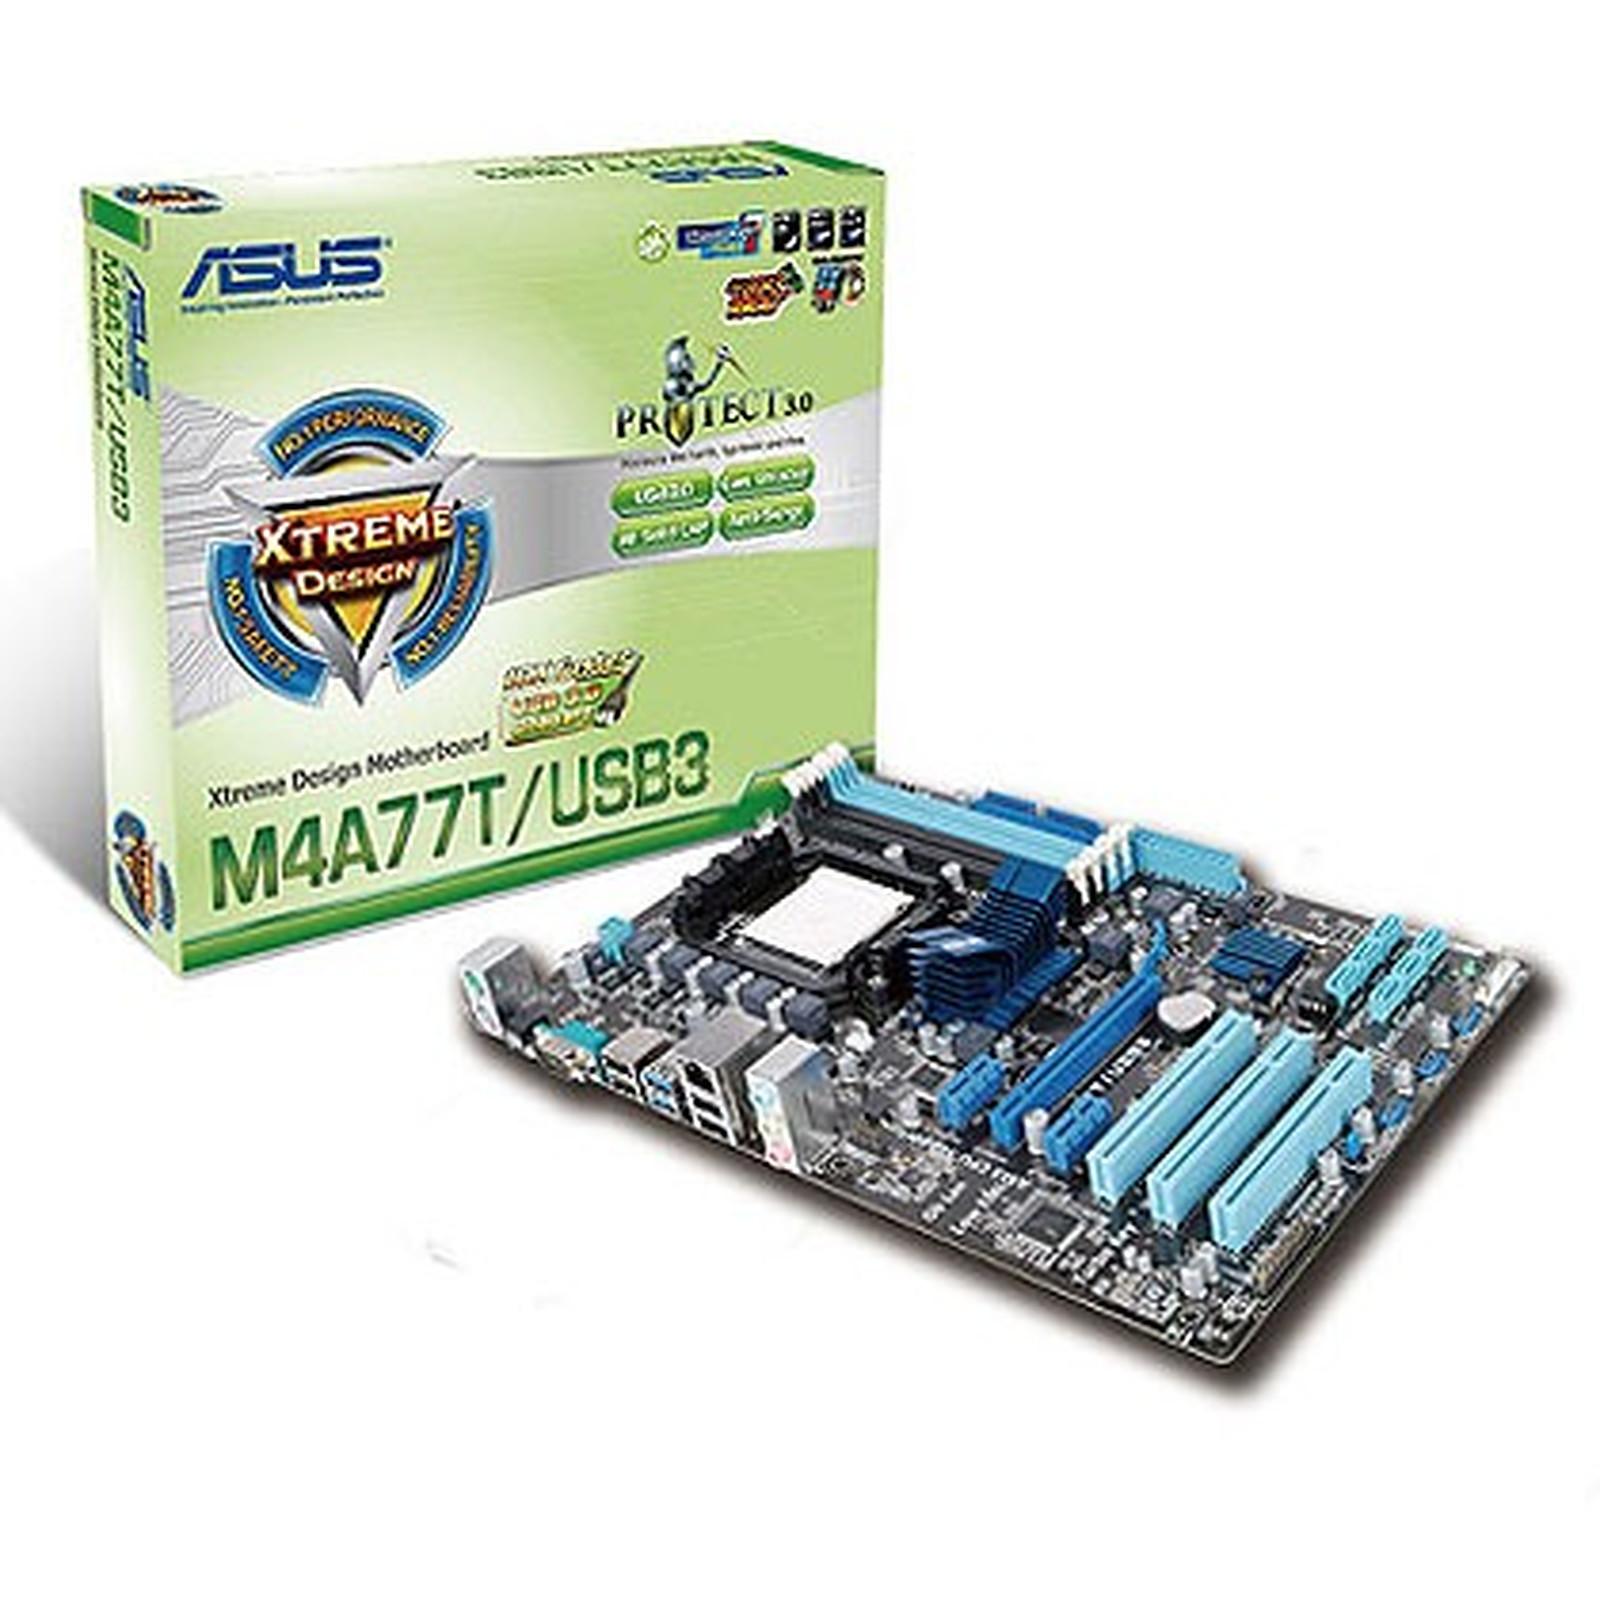 ASUS M4A77T/USB3